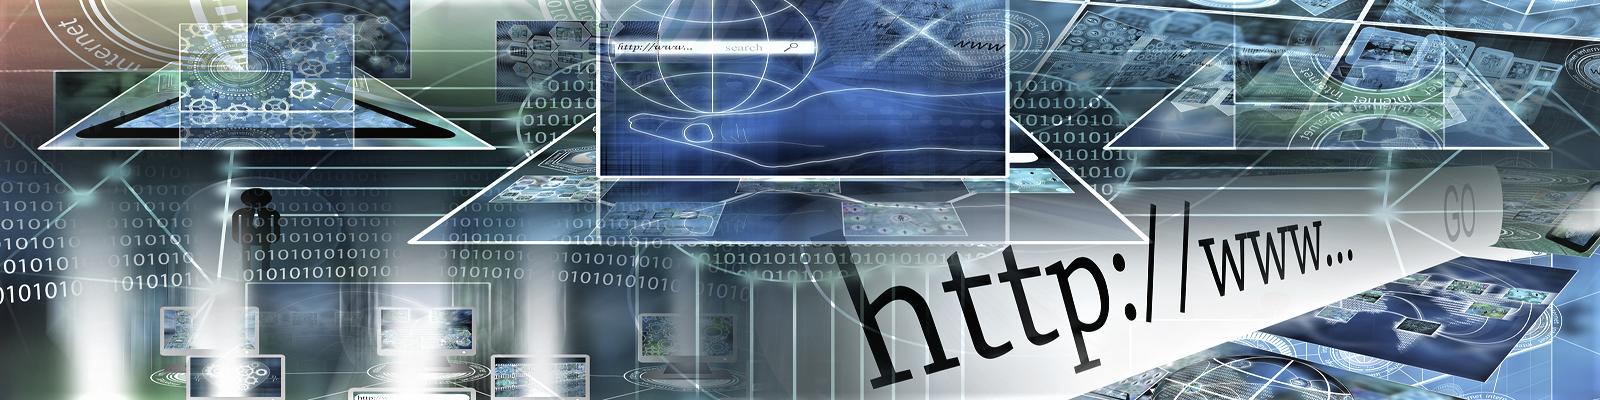 Mont Digital Responsive Web Design